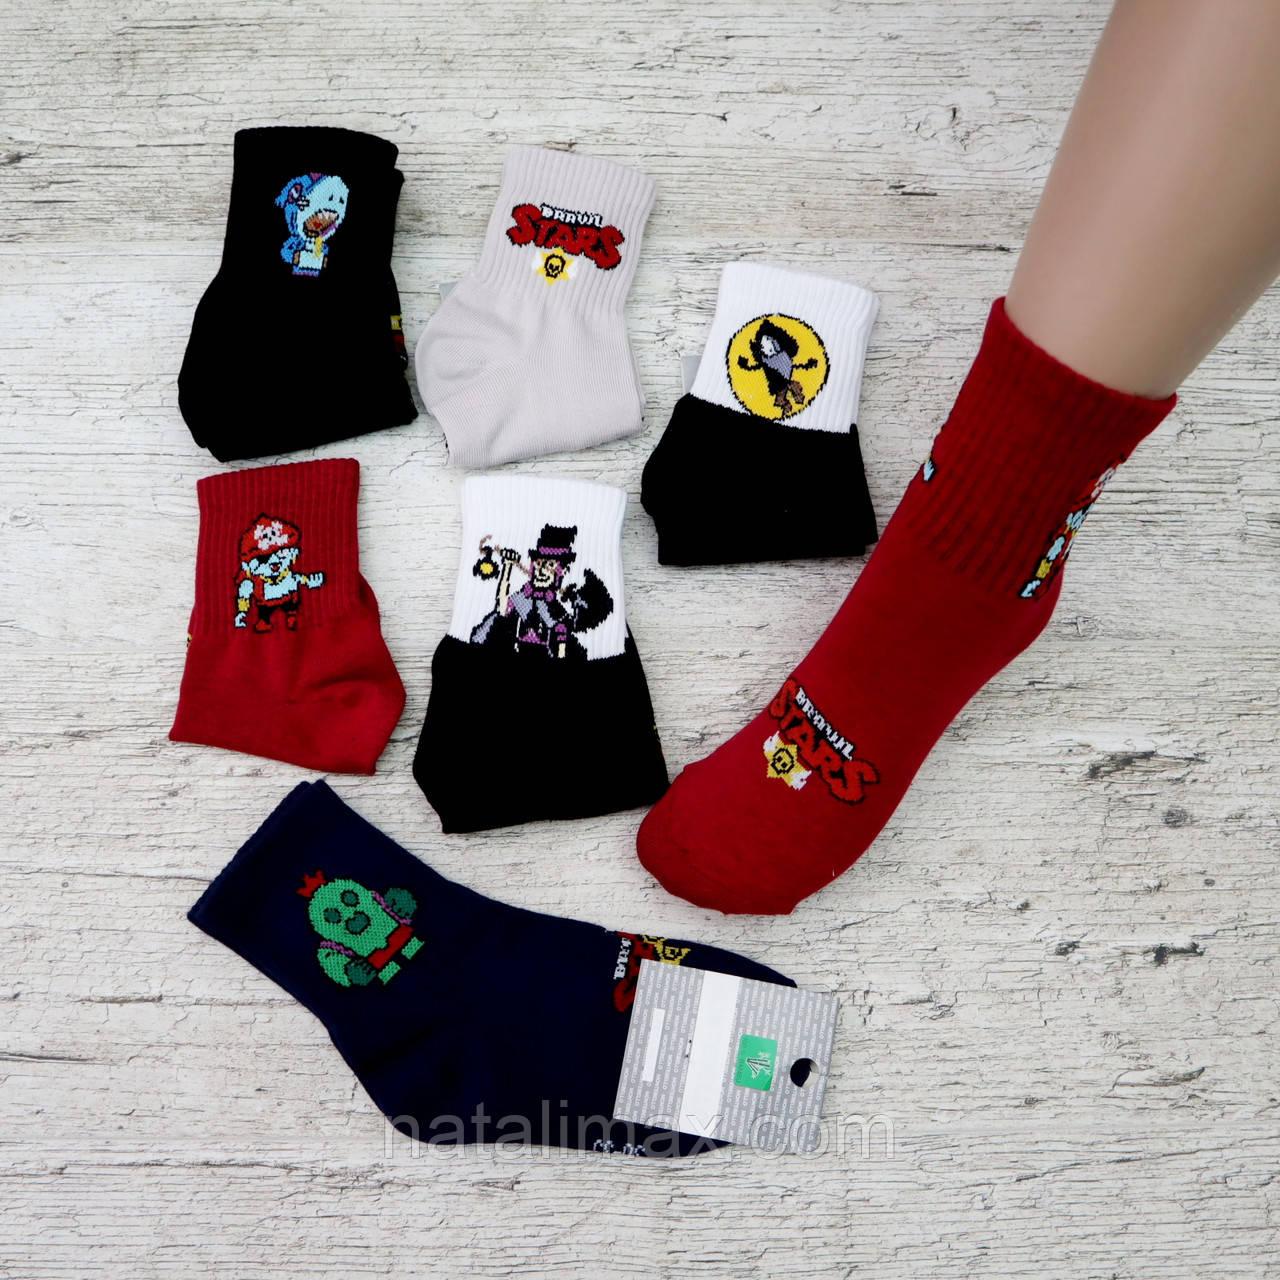 "Детские носочки ""Brawl Stars"", размер 30-35. Носки для мальчика, Турция"